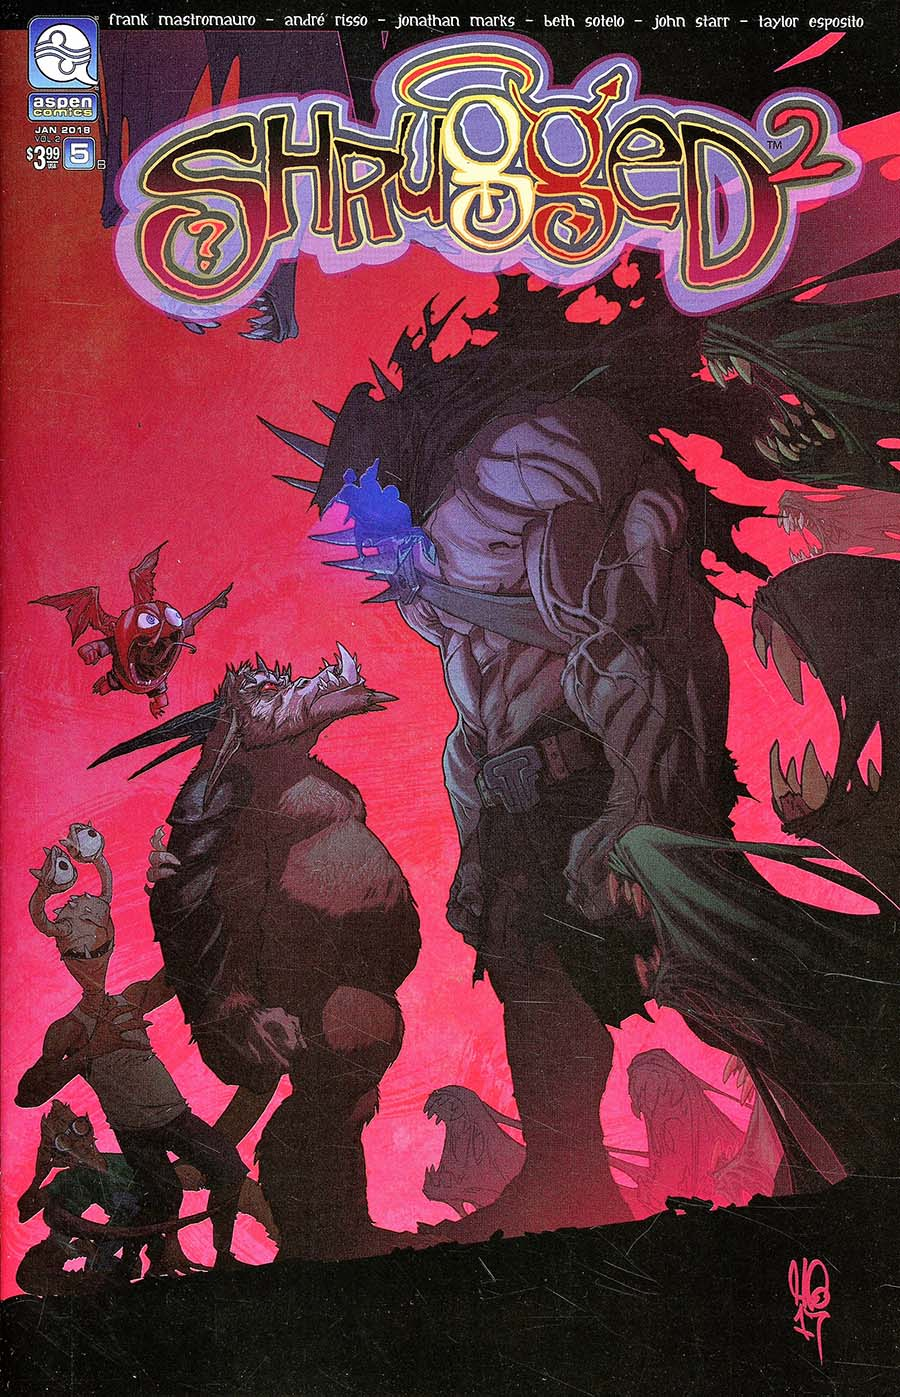 Shrugged Vol 2 #5 Cover B Micah Gunnell